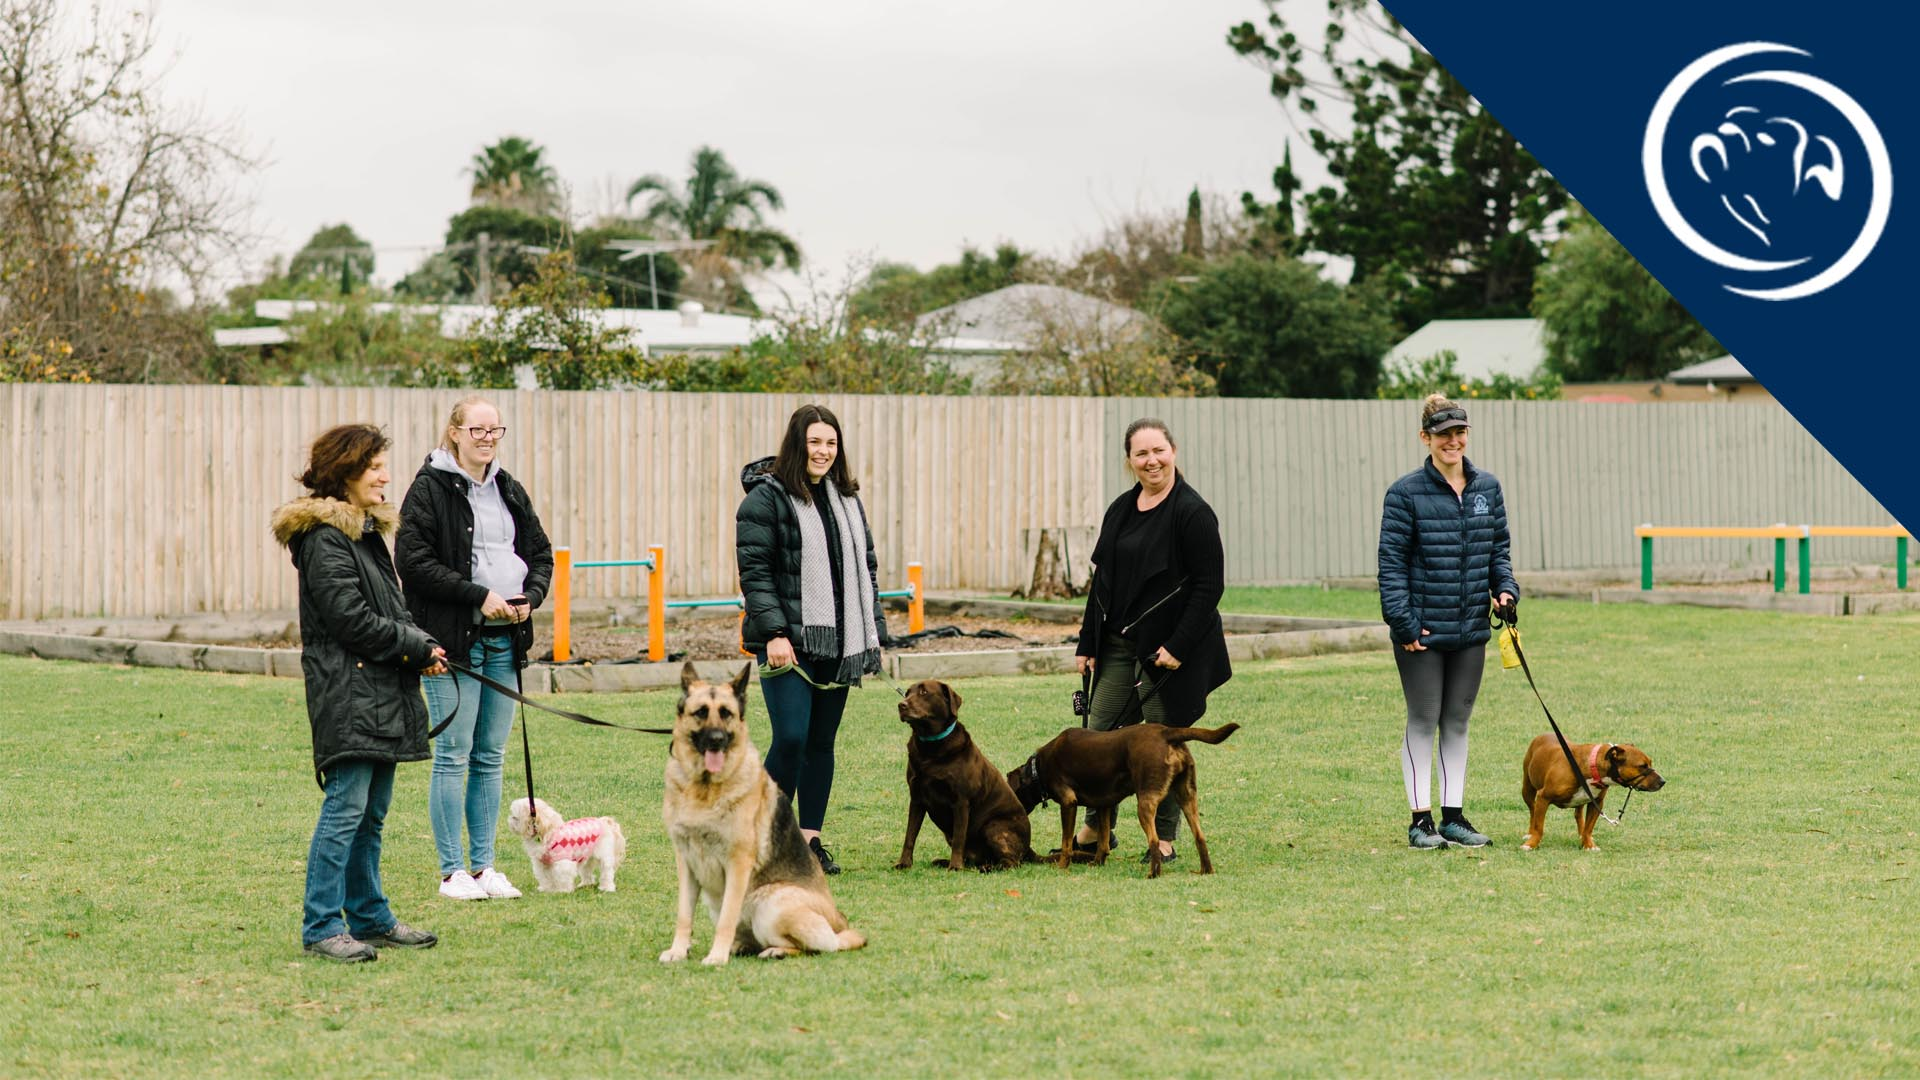 sankiri-dog-training-online-training-8-week-course